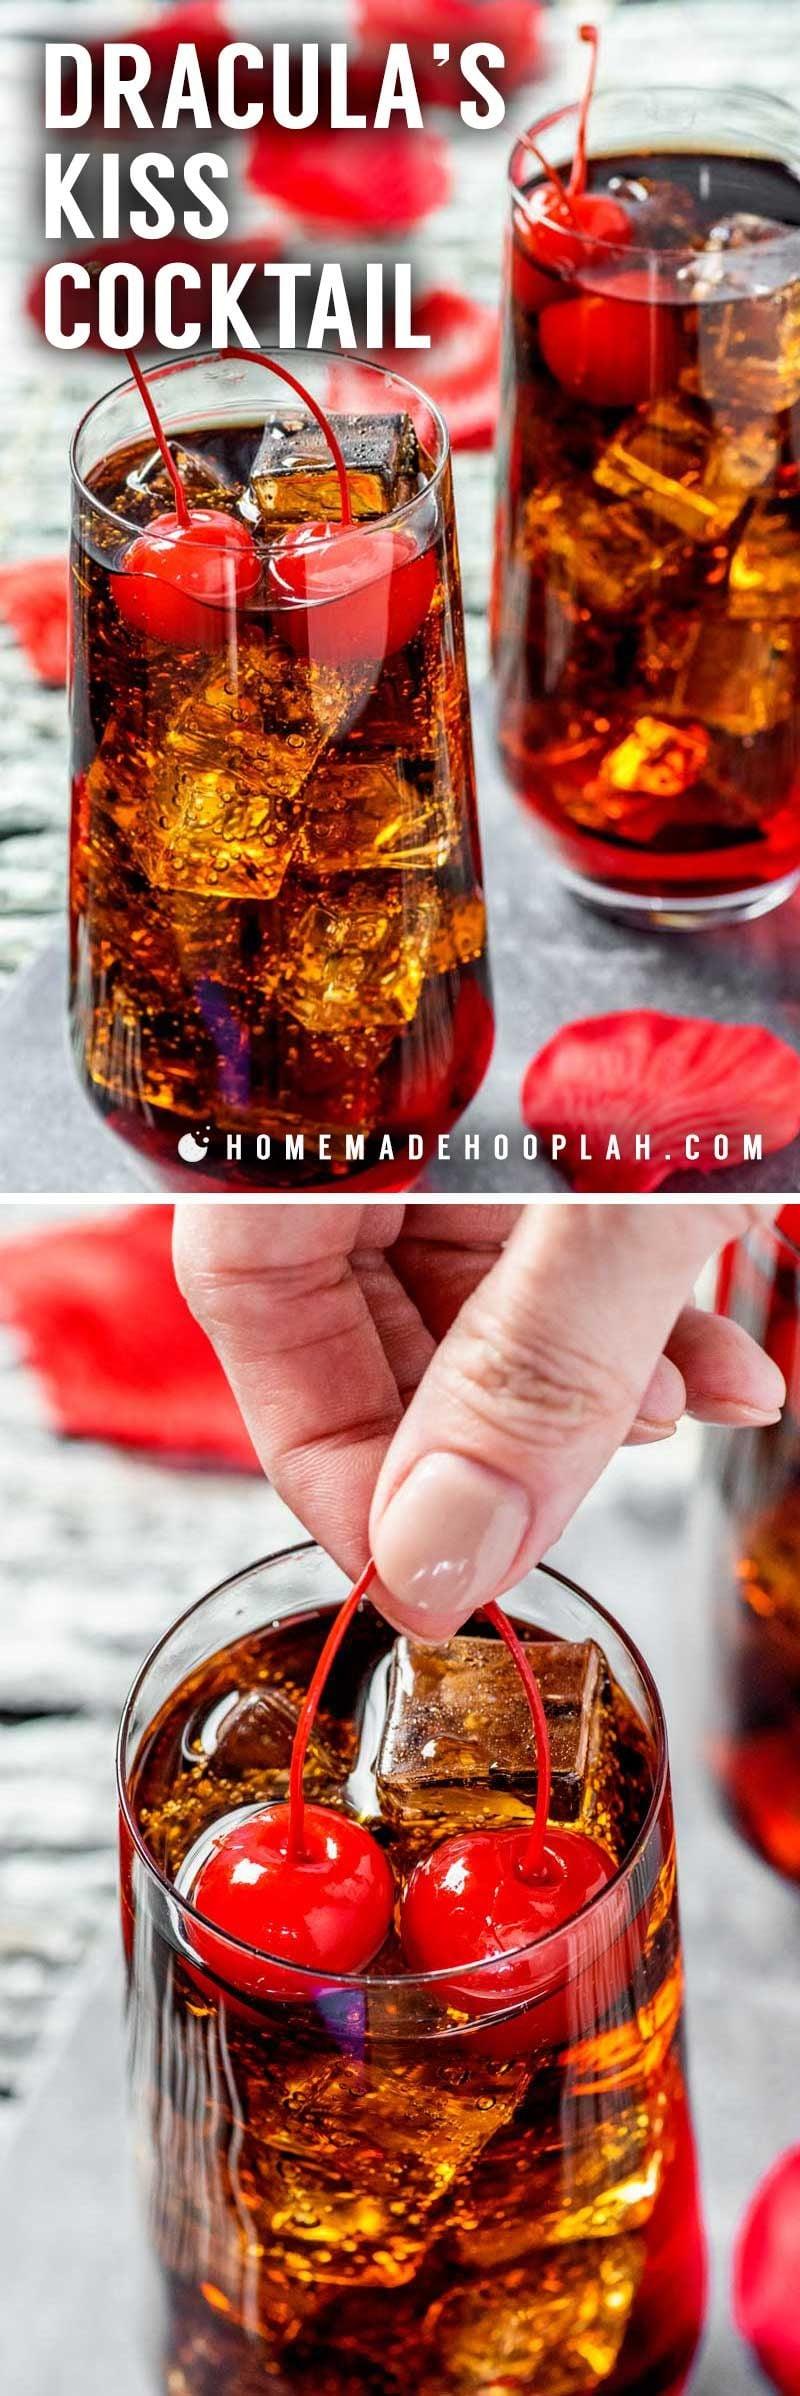 A vampire cherry Coke cocktail for Halloween.